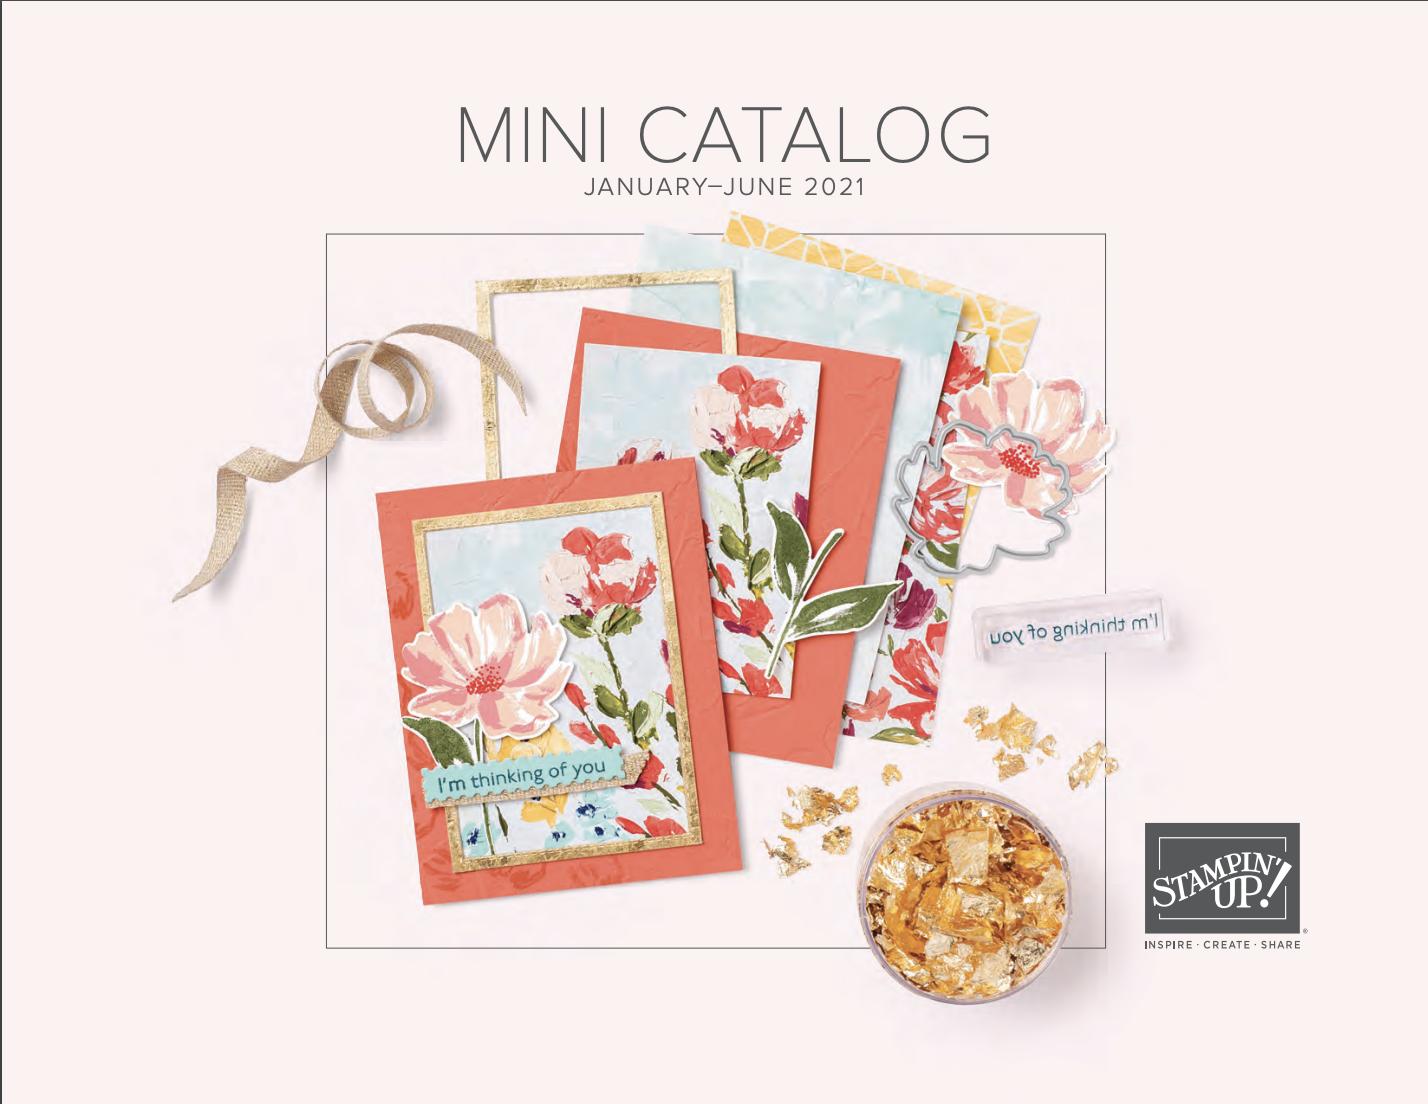 Spring 2021 Mini Catalog